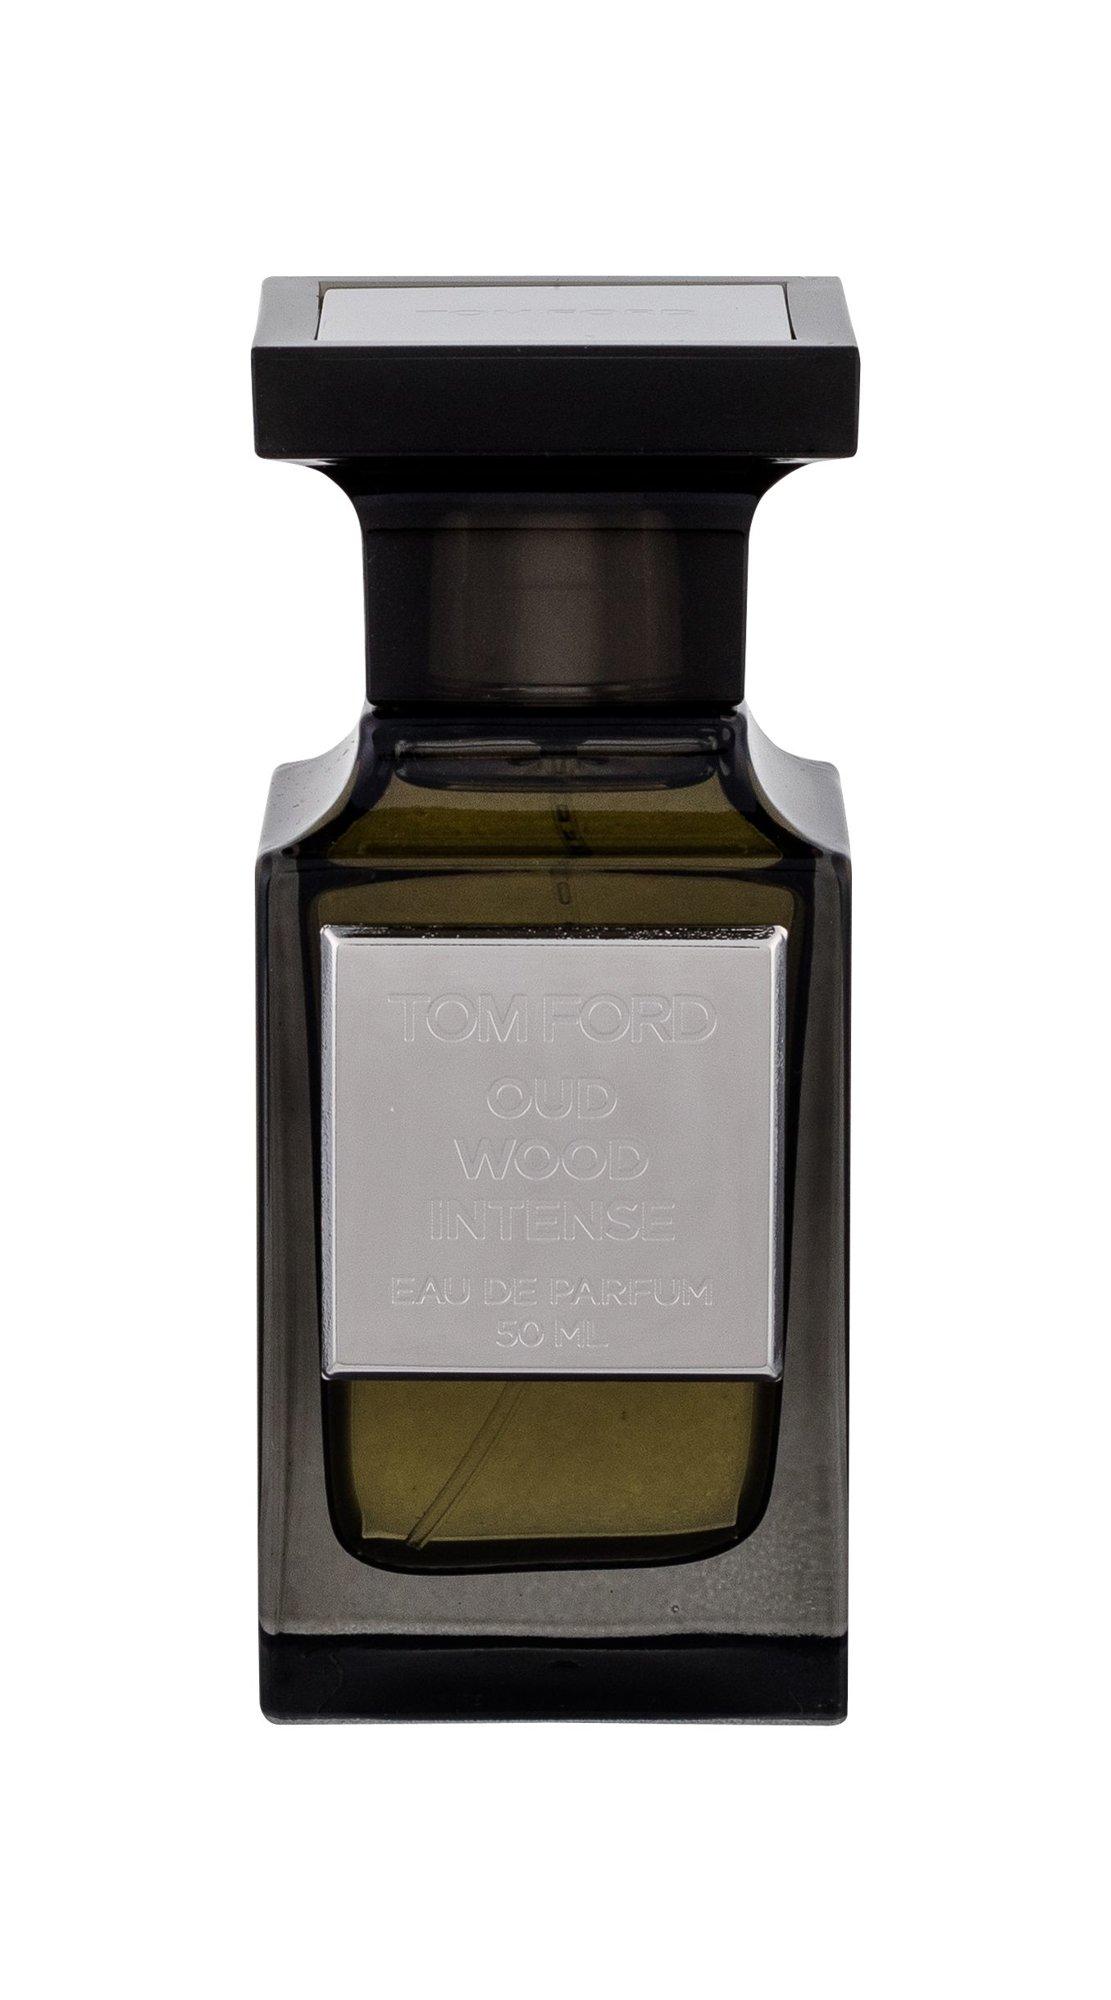 TOM FORD Oud Wood Intense Eau de Parfum 50ml